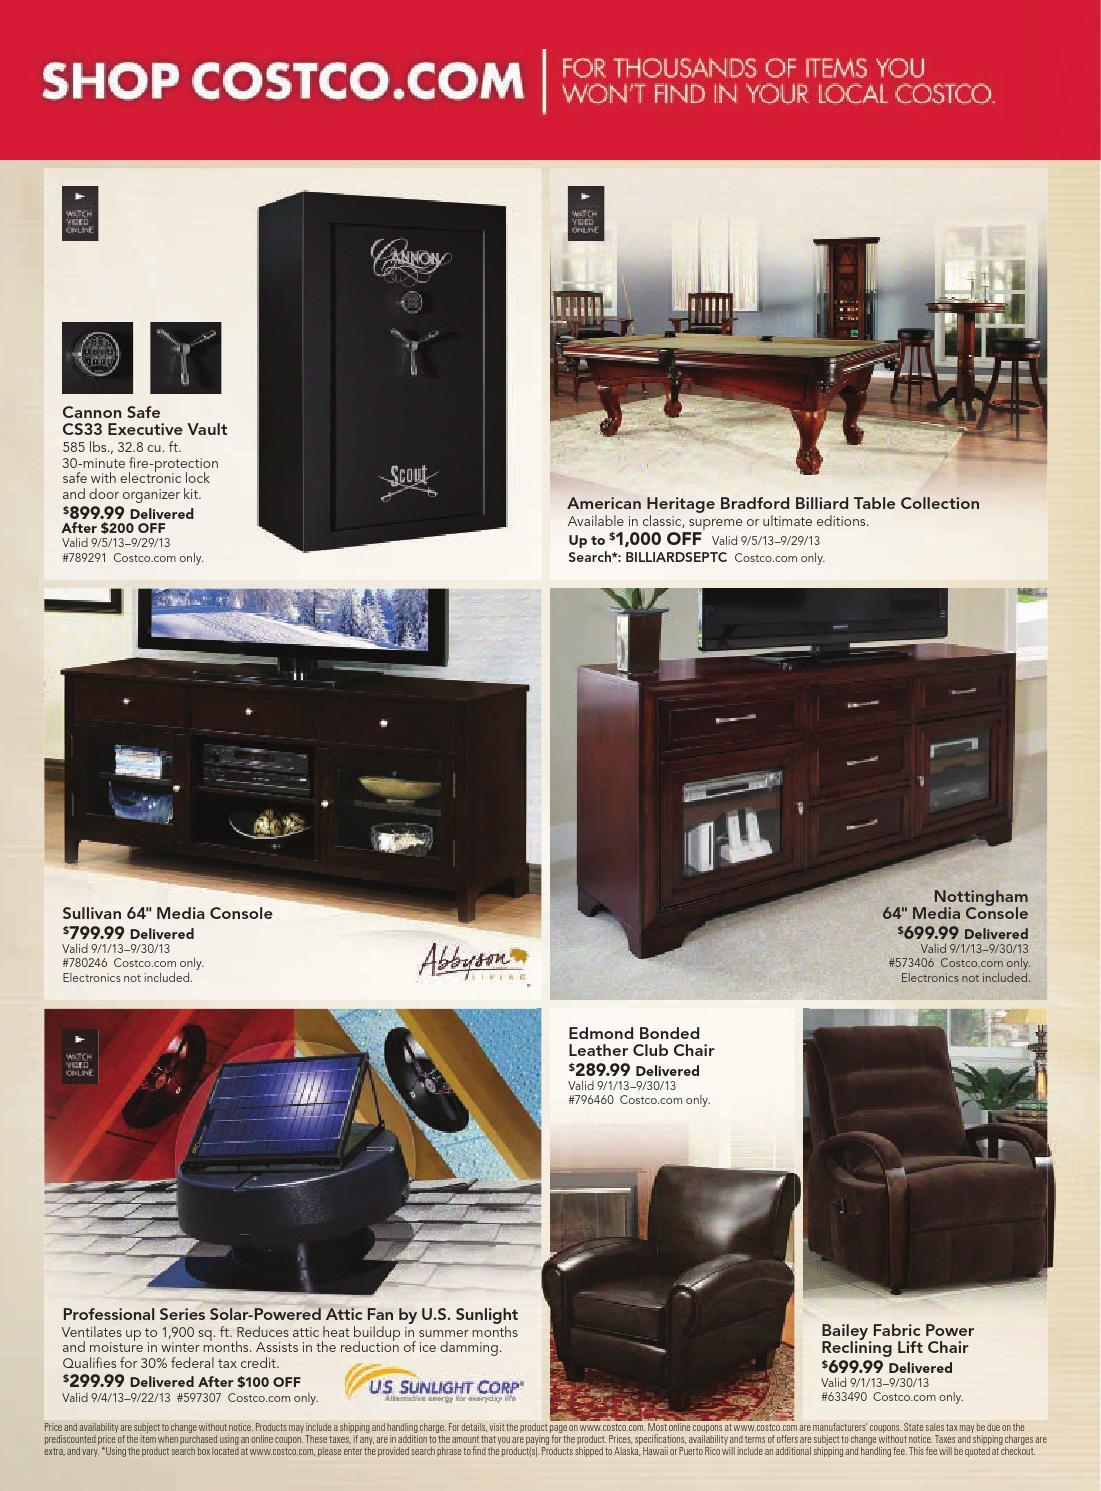 Admirable Costco Flyer Valid Until Sept 30 By Broshuri Issuu Machost Co Dining Chair Design Ideas Machostcouk